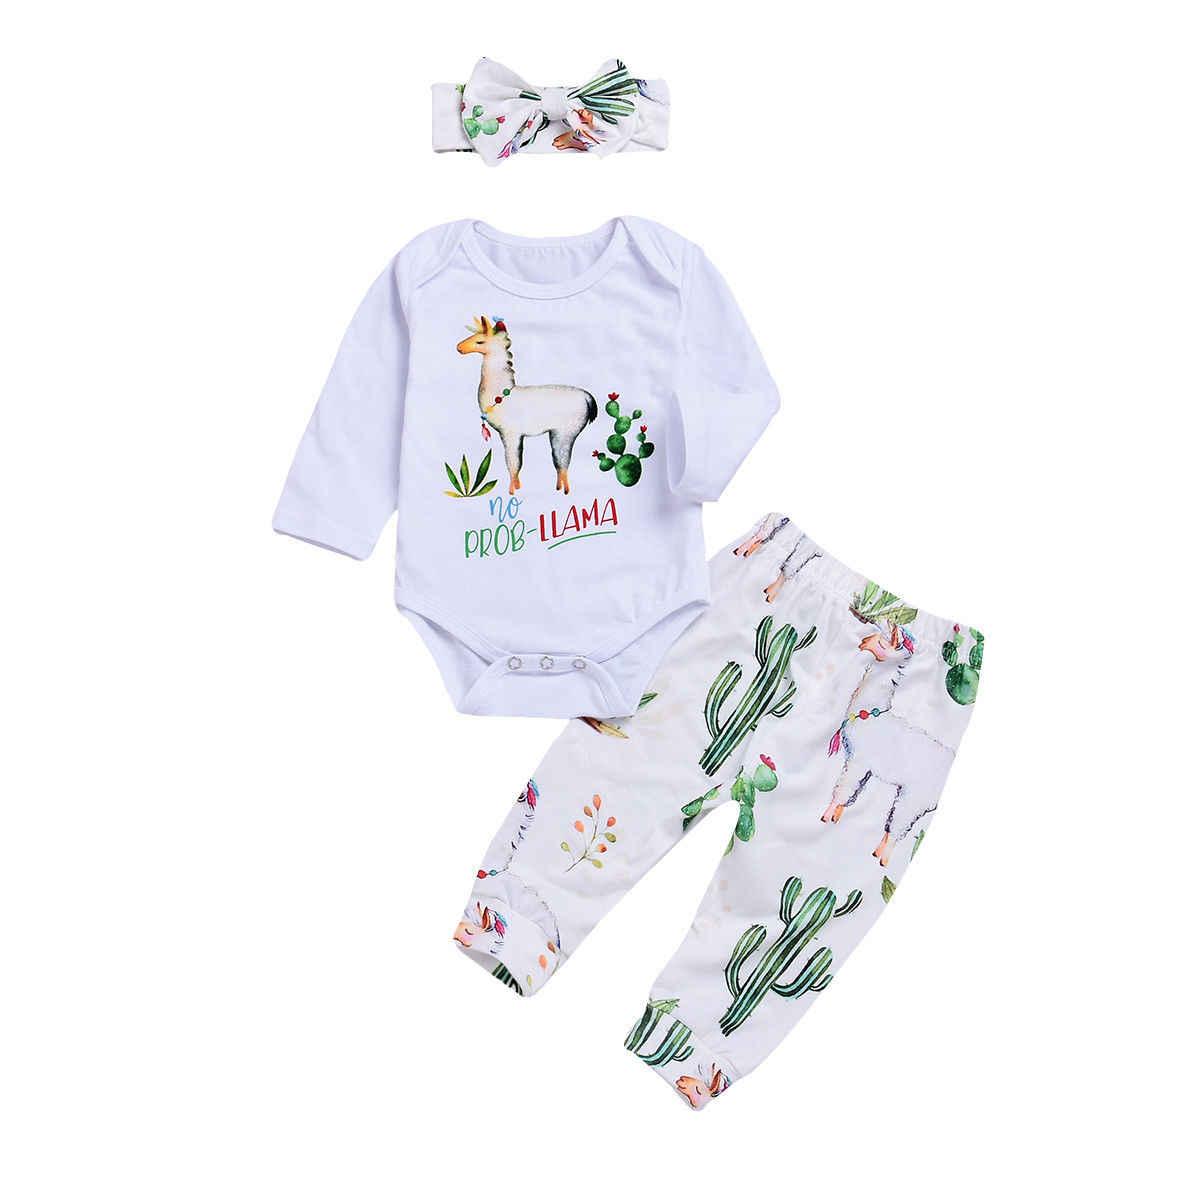 37146adb755b Detail Feedback Questions about Newborn Baby Autumn Winter Clothing Sets  Infant Boys Girls Cute Alpaca Bodysuits+Floral Pants+Headbands 3pcs Outfits  Set ...